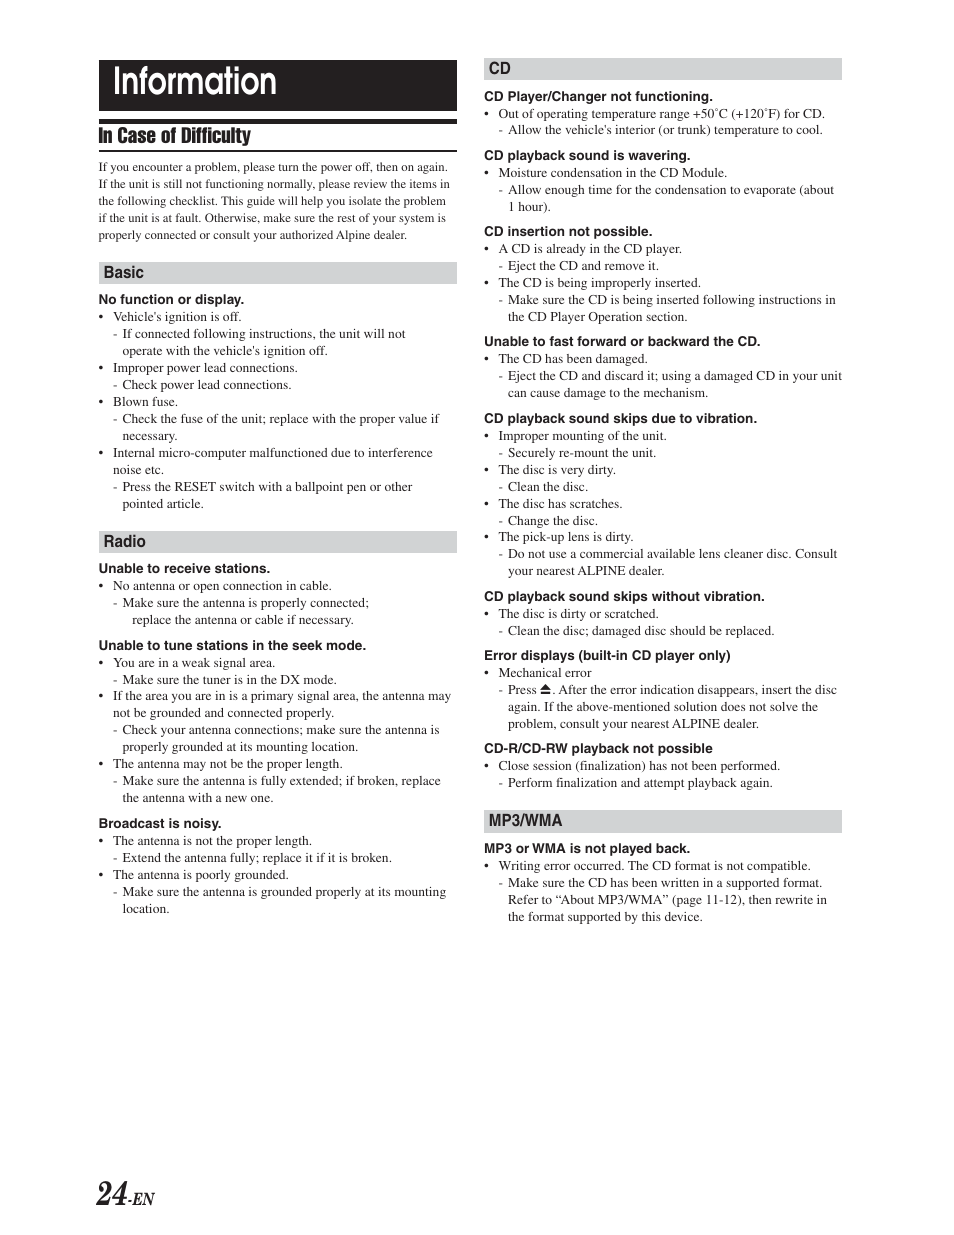 Troubleshooting, Information | Alpine CDA-9847 User Manual | Page 25 / 34